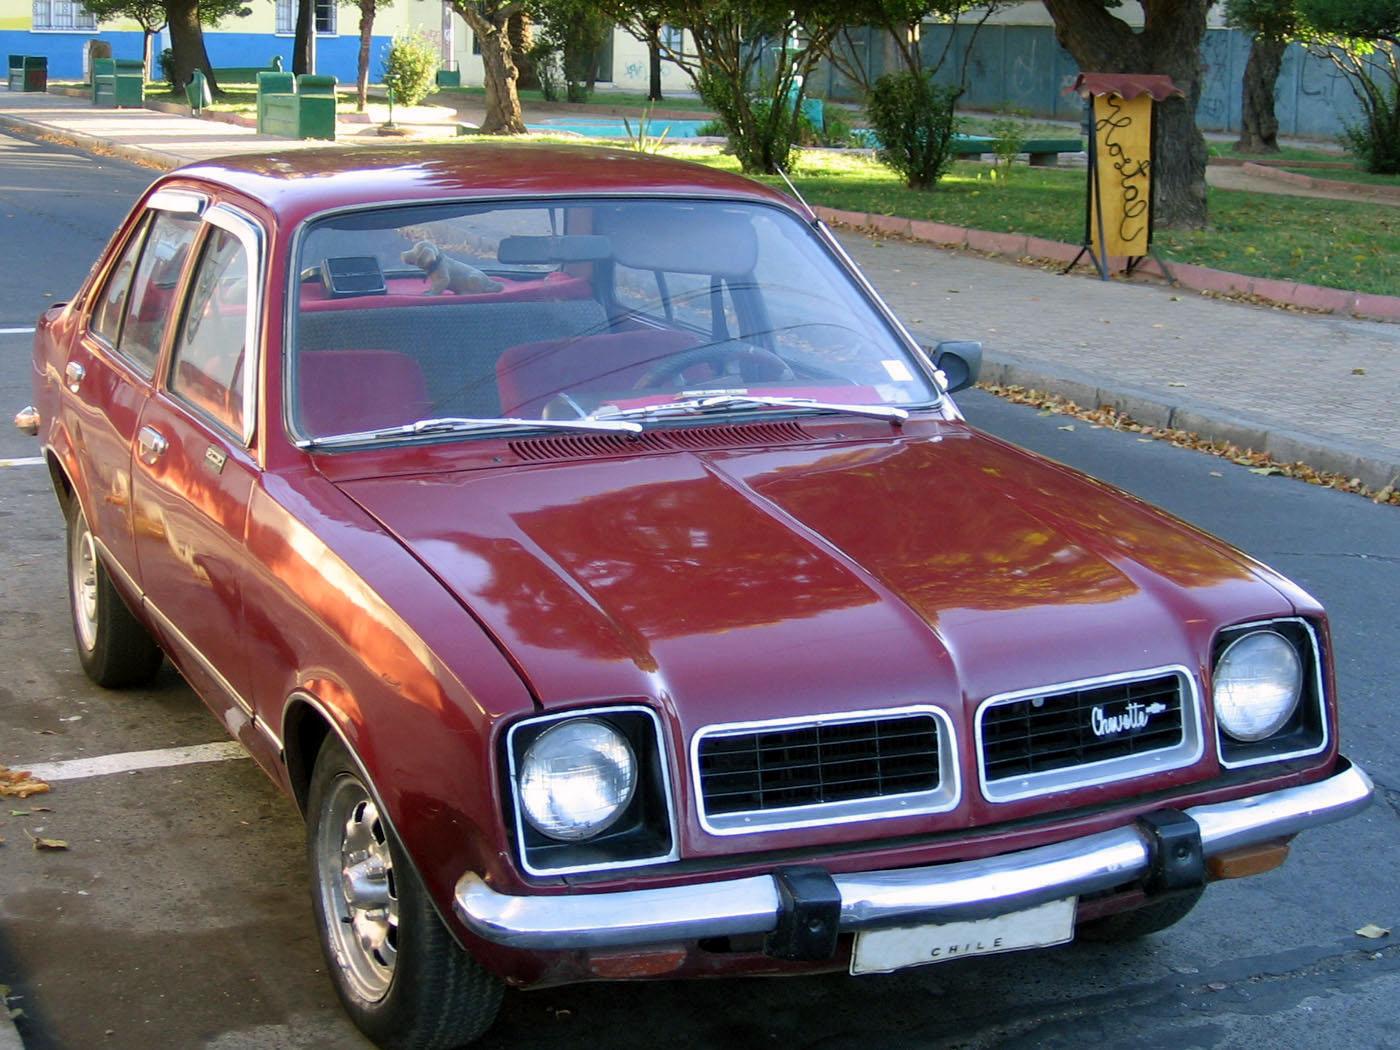 1979 Chevy Chevette